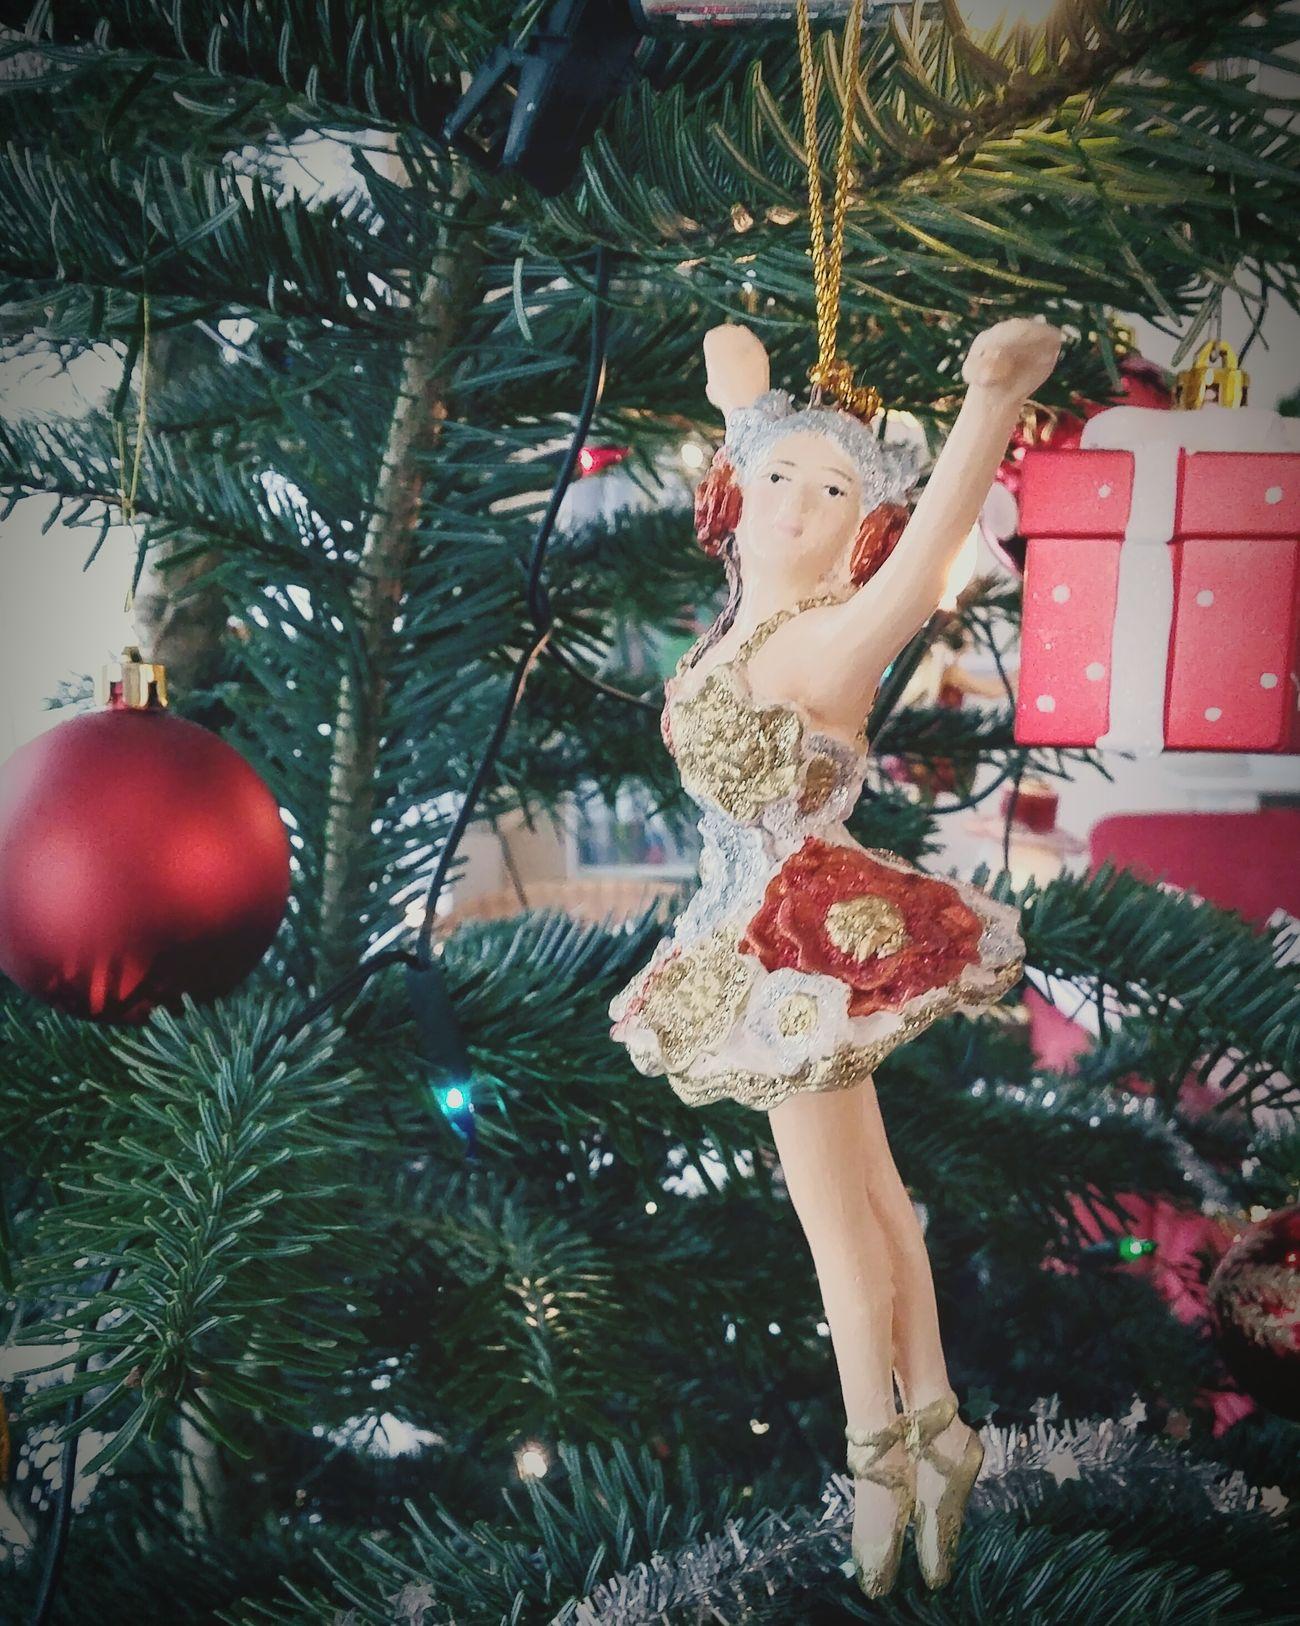 Christmas Decorations Dancer Christmas Tree Christmastime Weihnachten Xmas Tänzerin Christbaum Ballerina Pastel Power